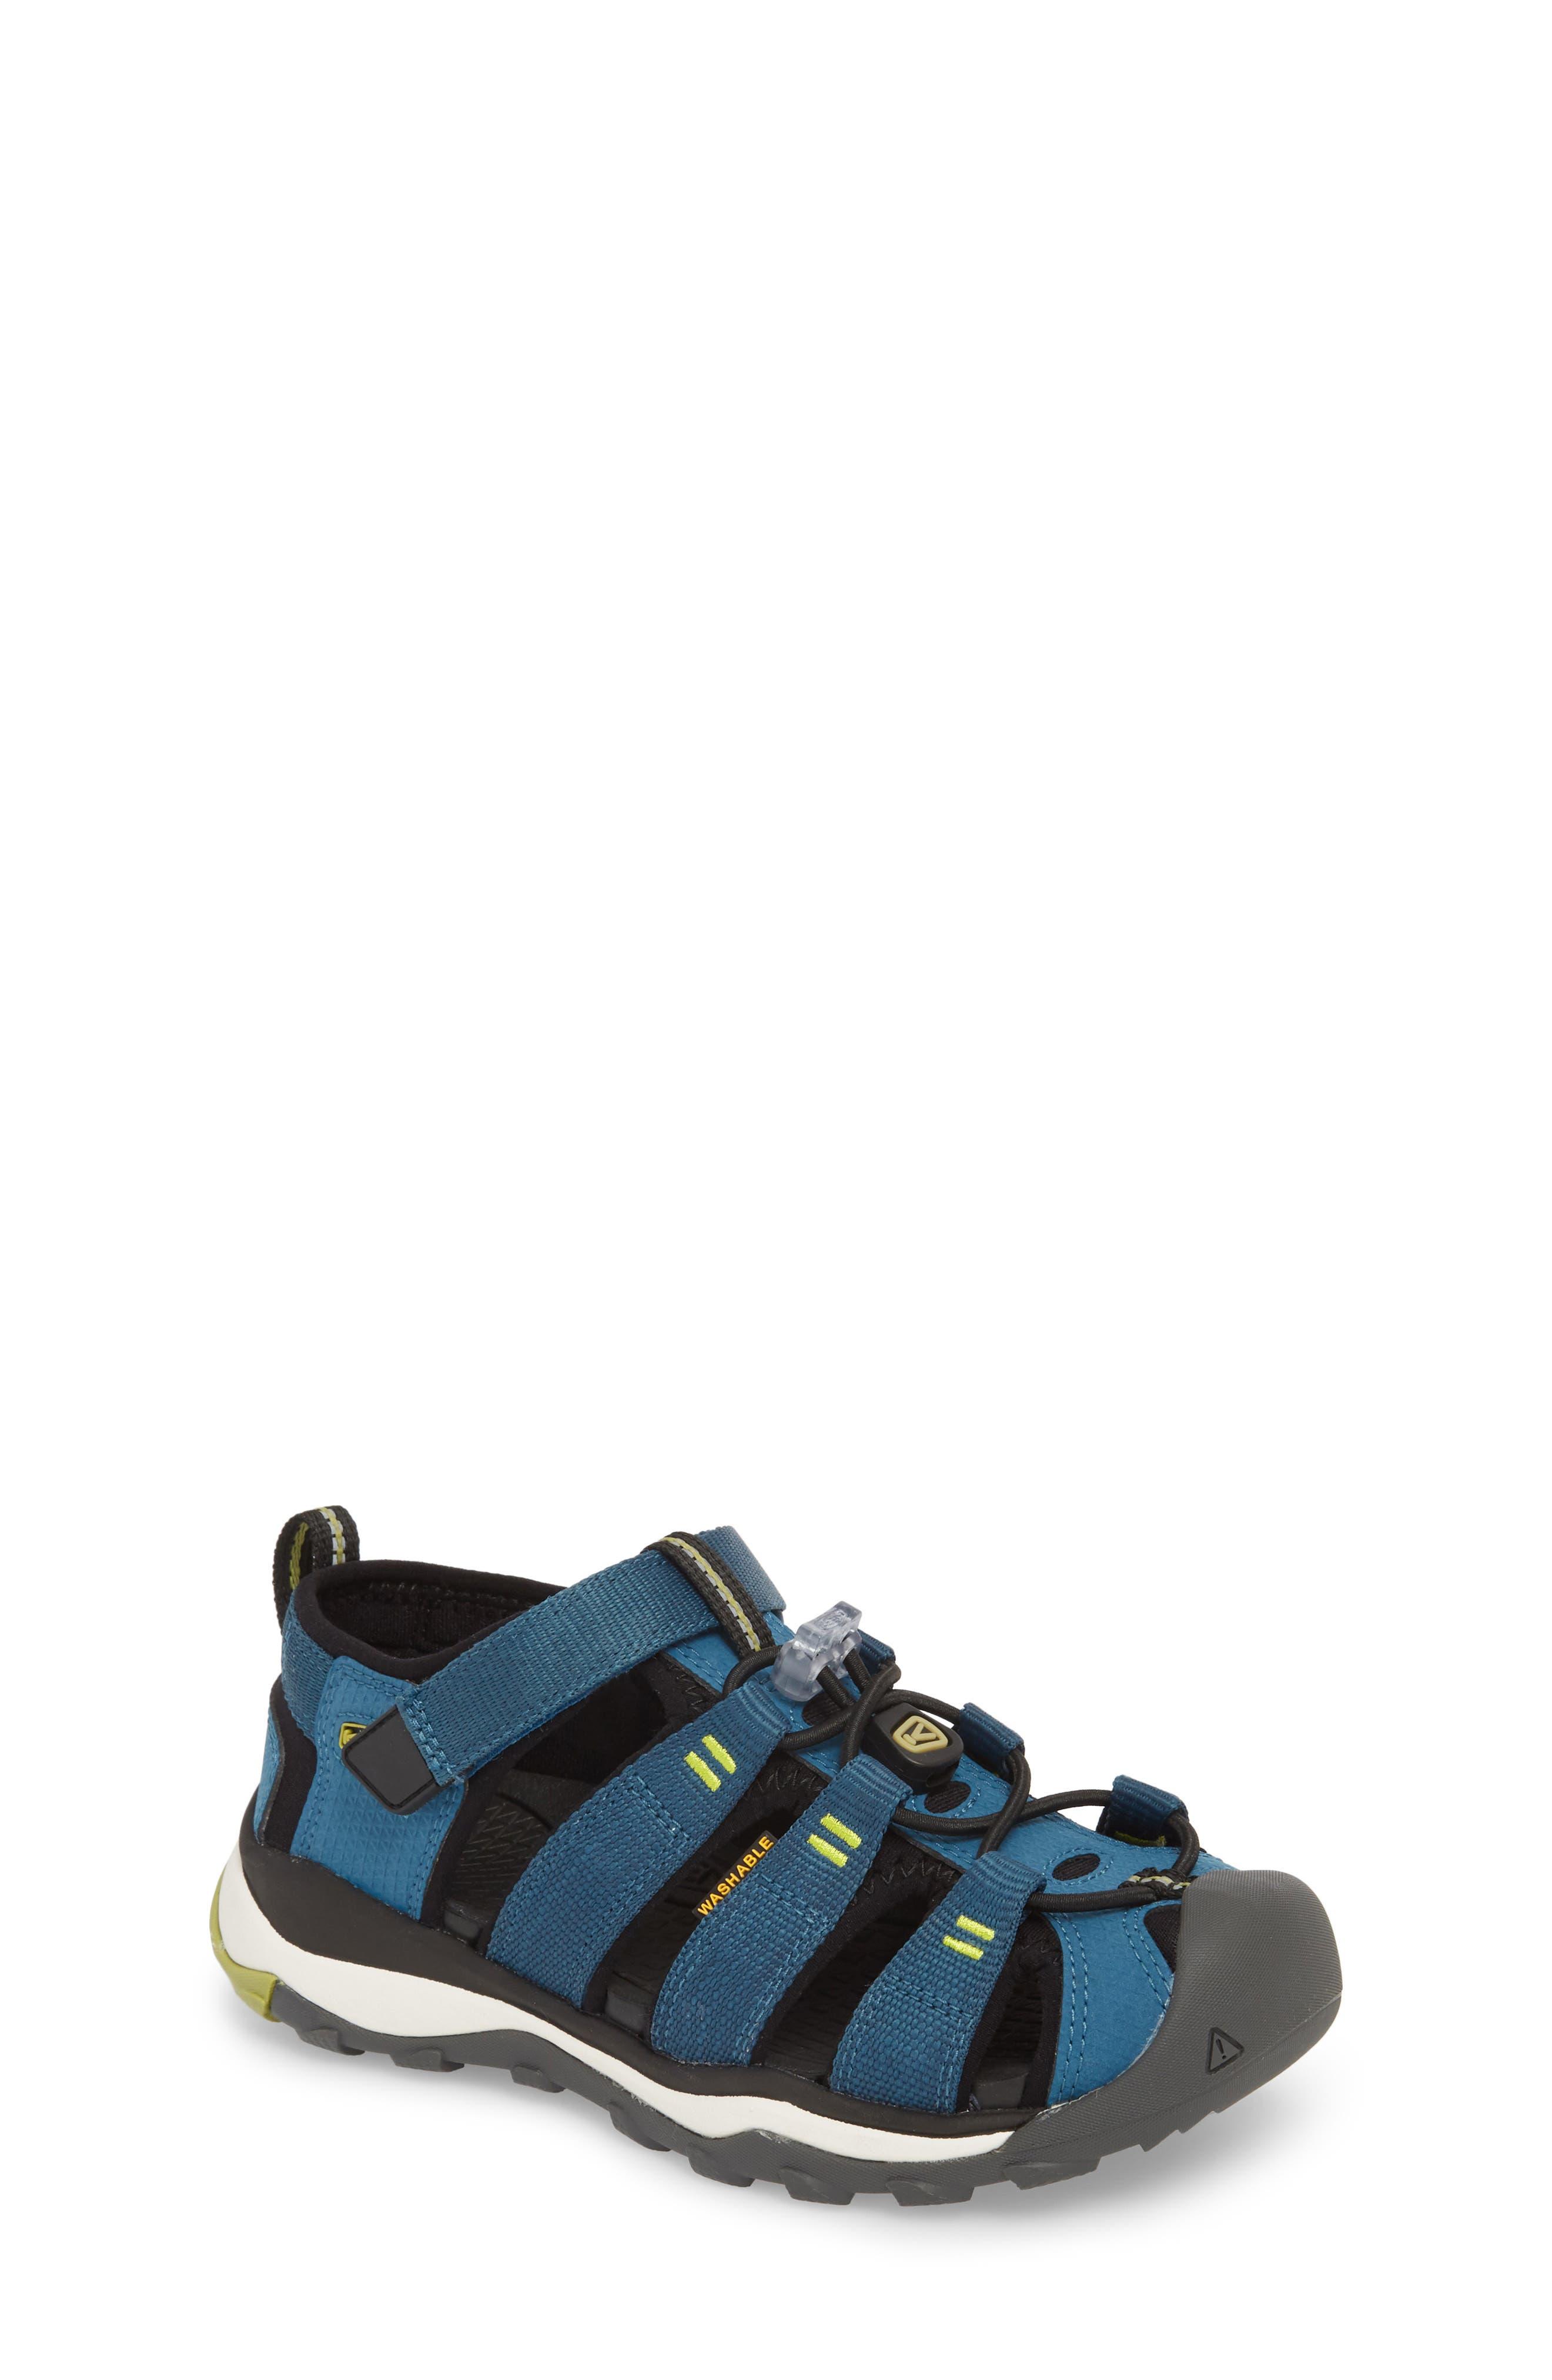 KEEN Newport Neo H2 Water Friendly Sandal, Main, color, LEGION BLUE/ MOSS